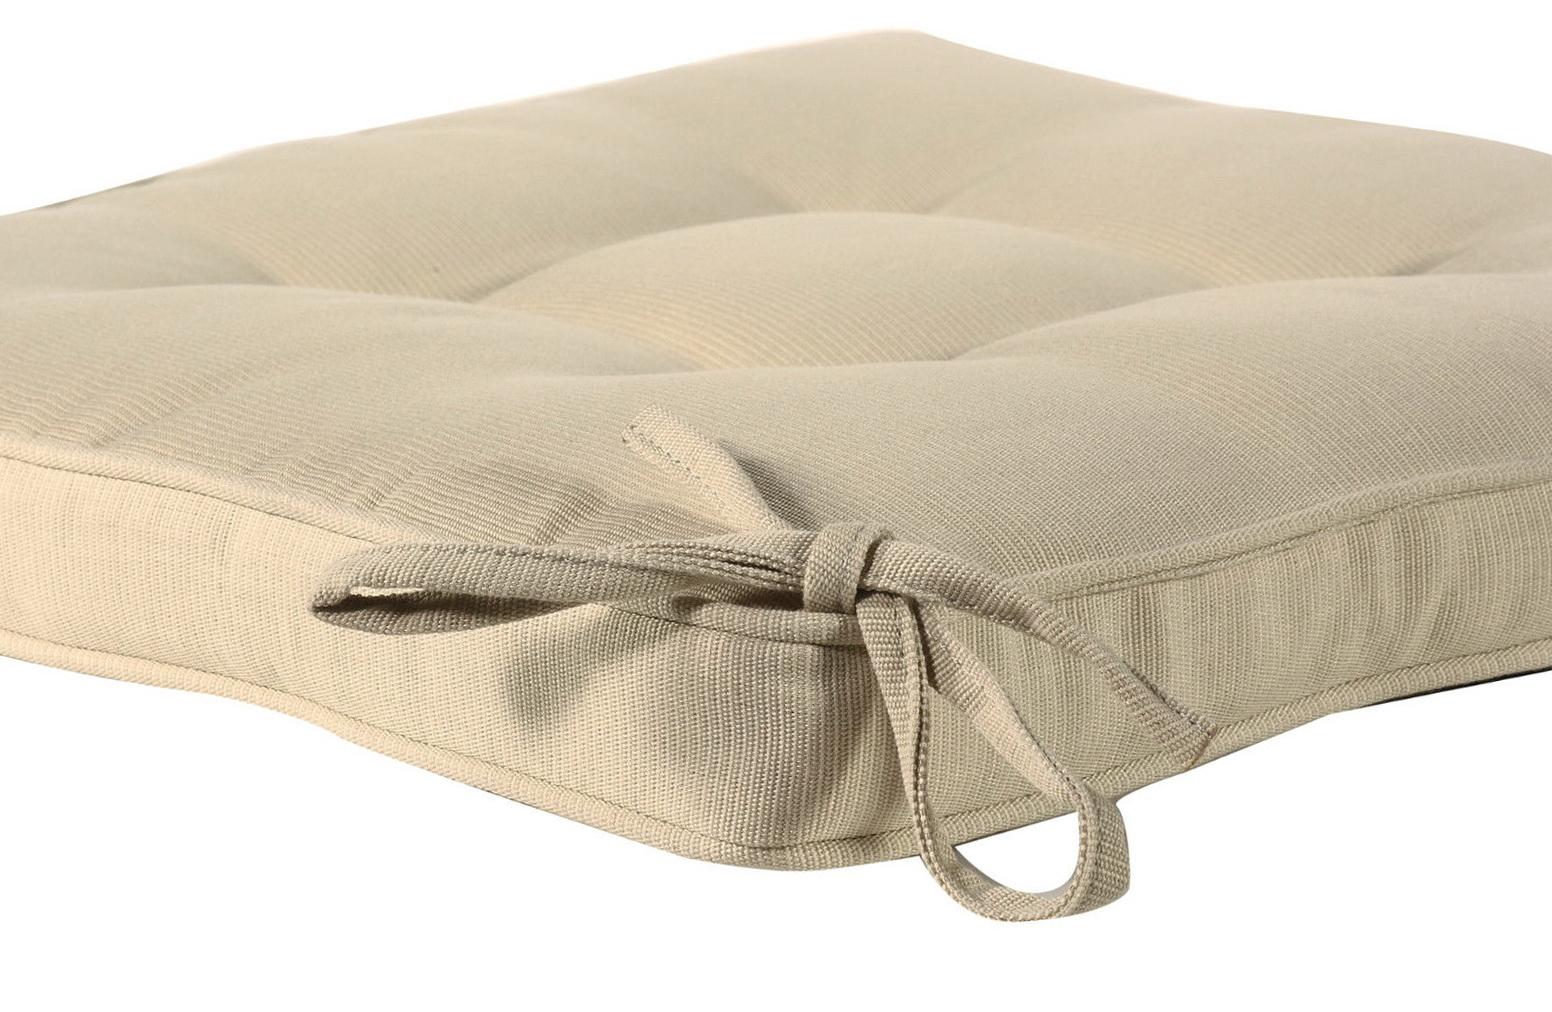 Chair Cushions With Ties Australia Home Design Ideas